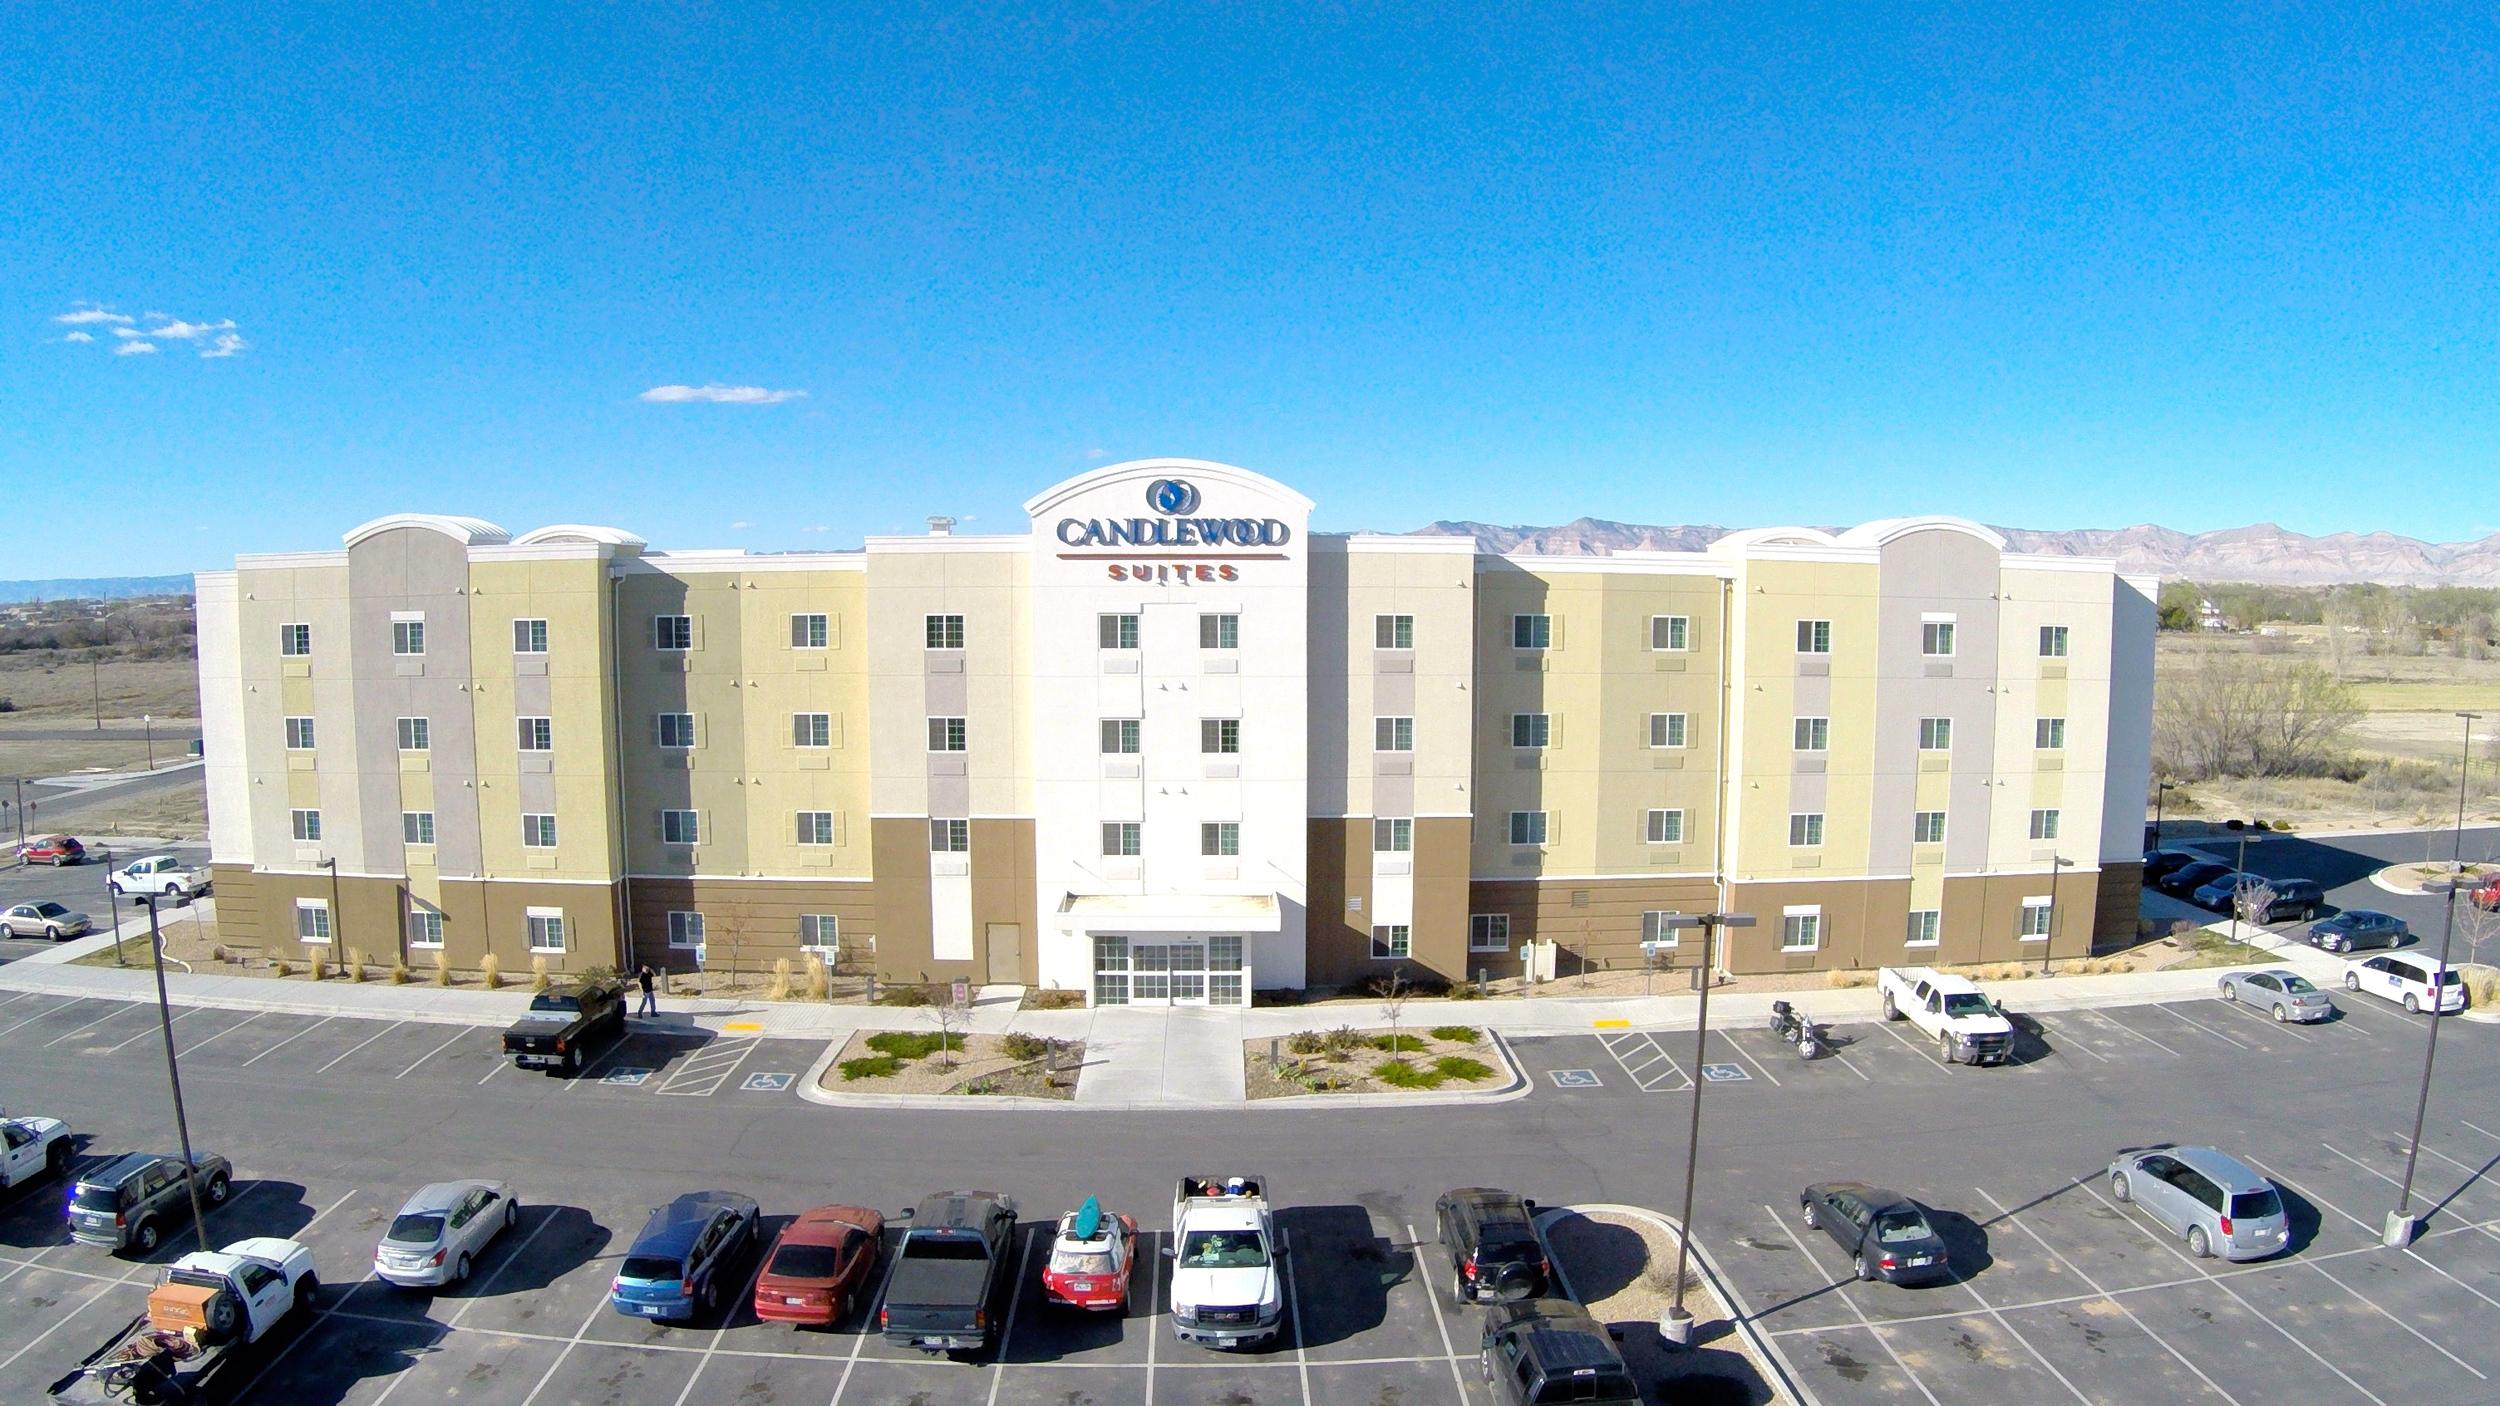 13 Grand Junction Candlewood Suites.JPG